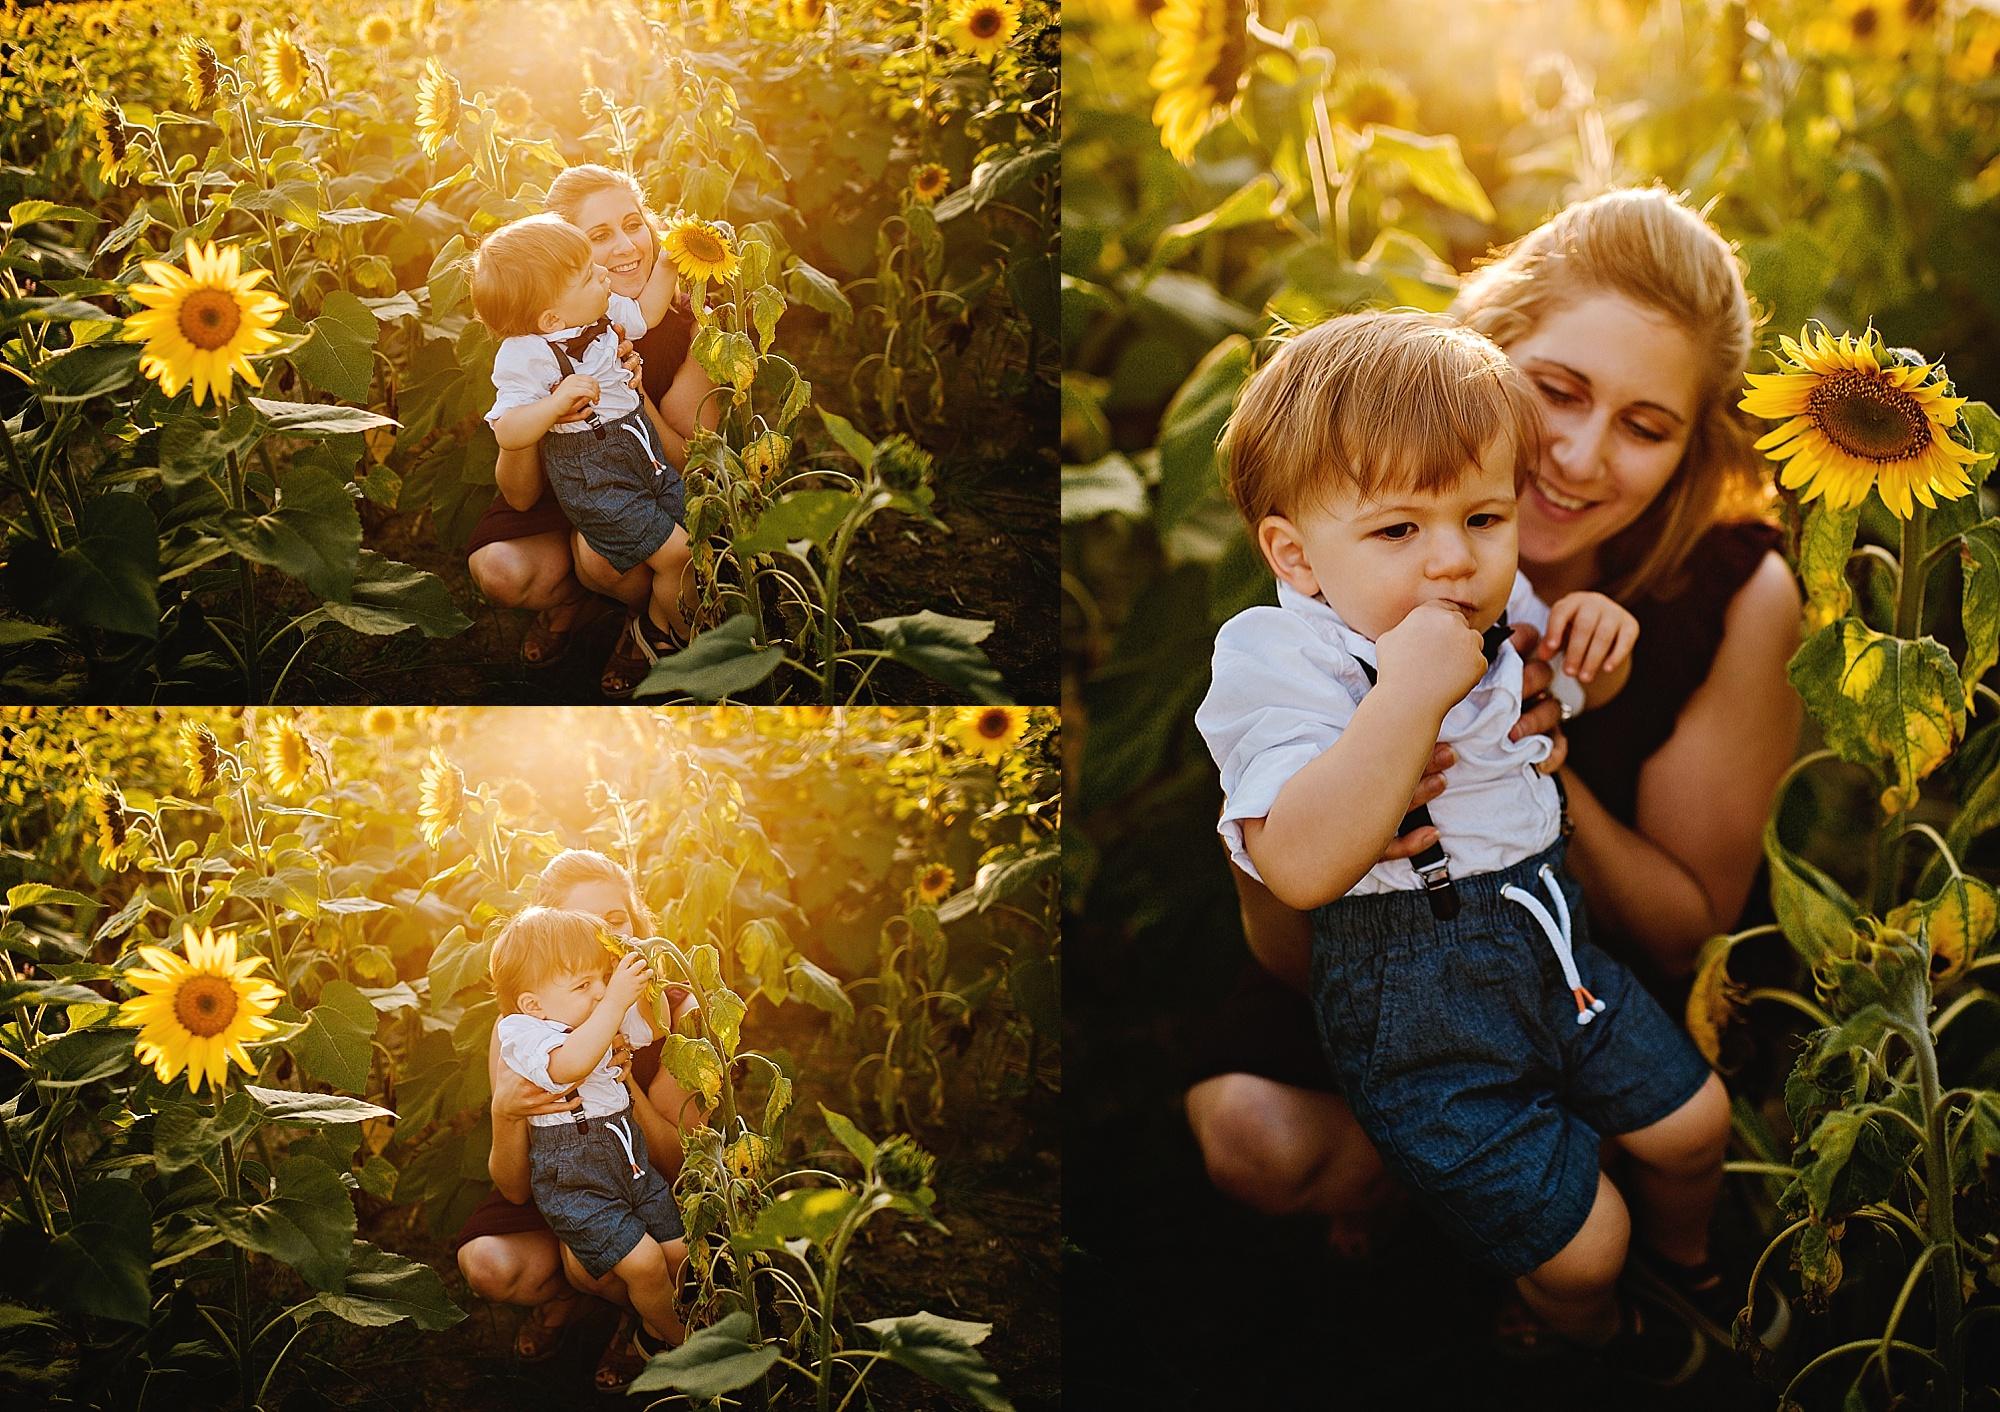 Schreiner-family-lauren-grayson-cleveland-photographer-sunflower-field-session_0019.jpg